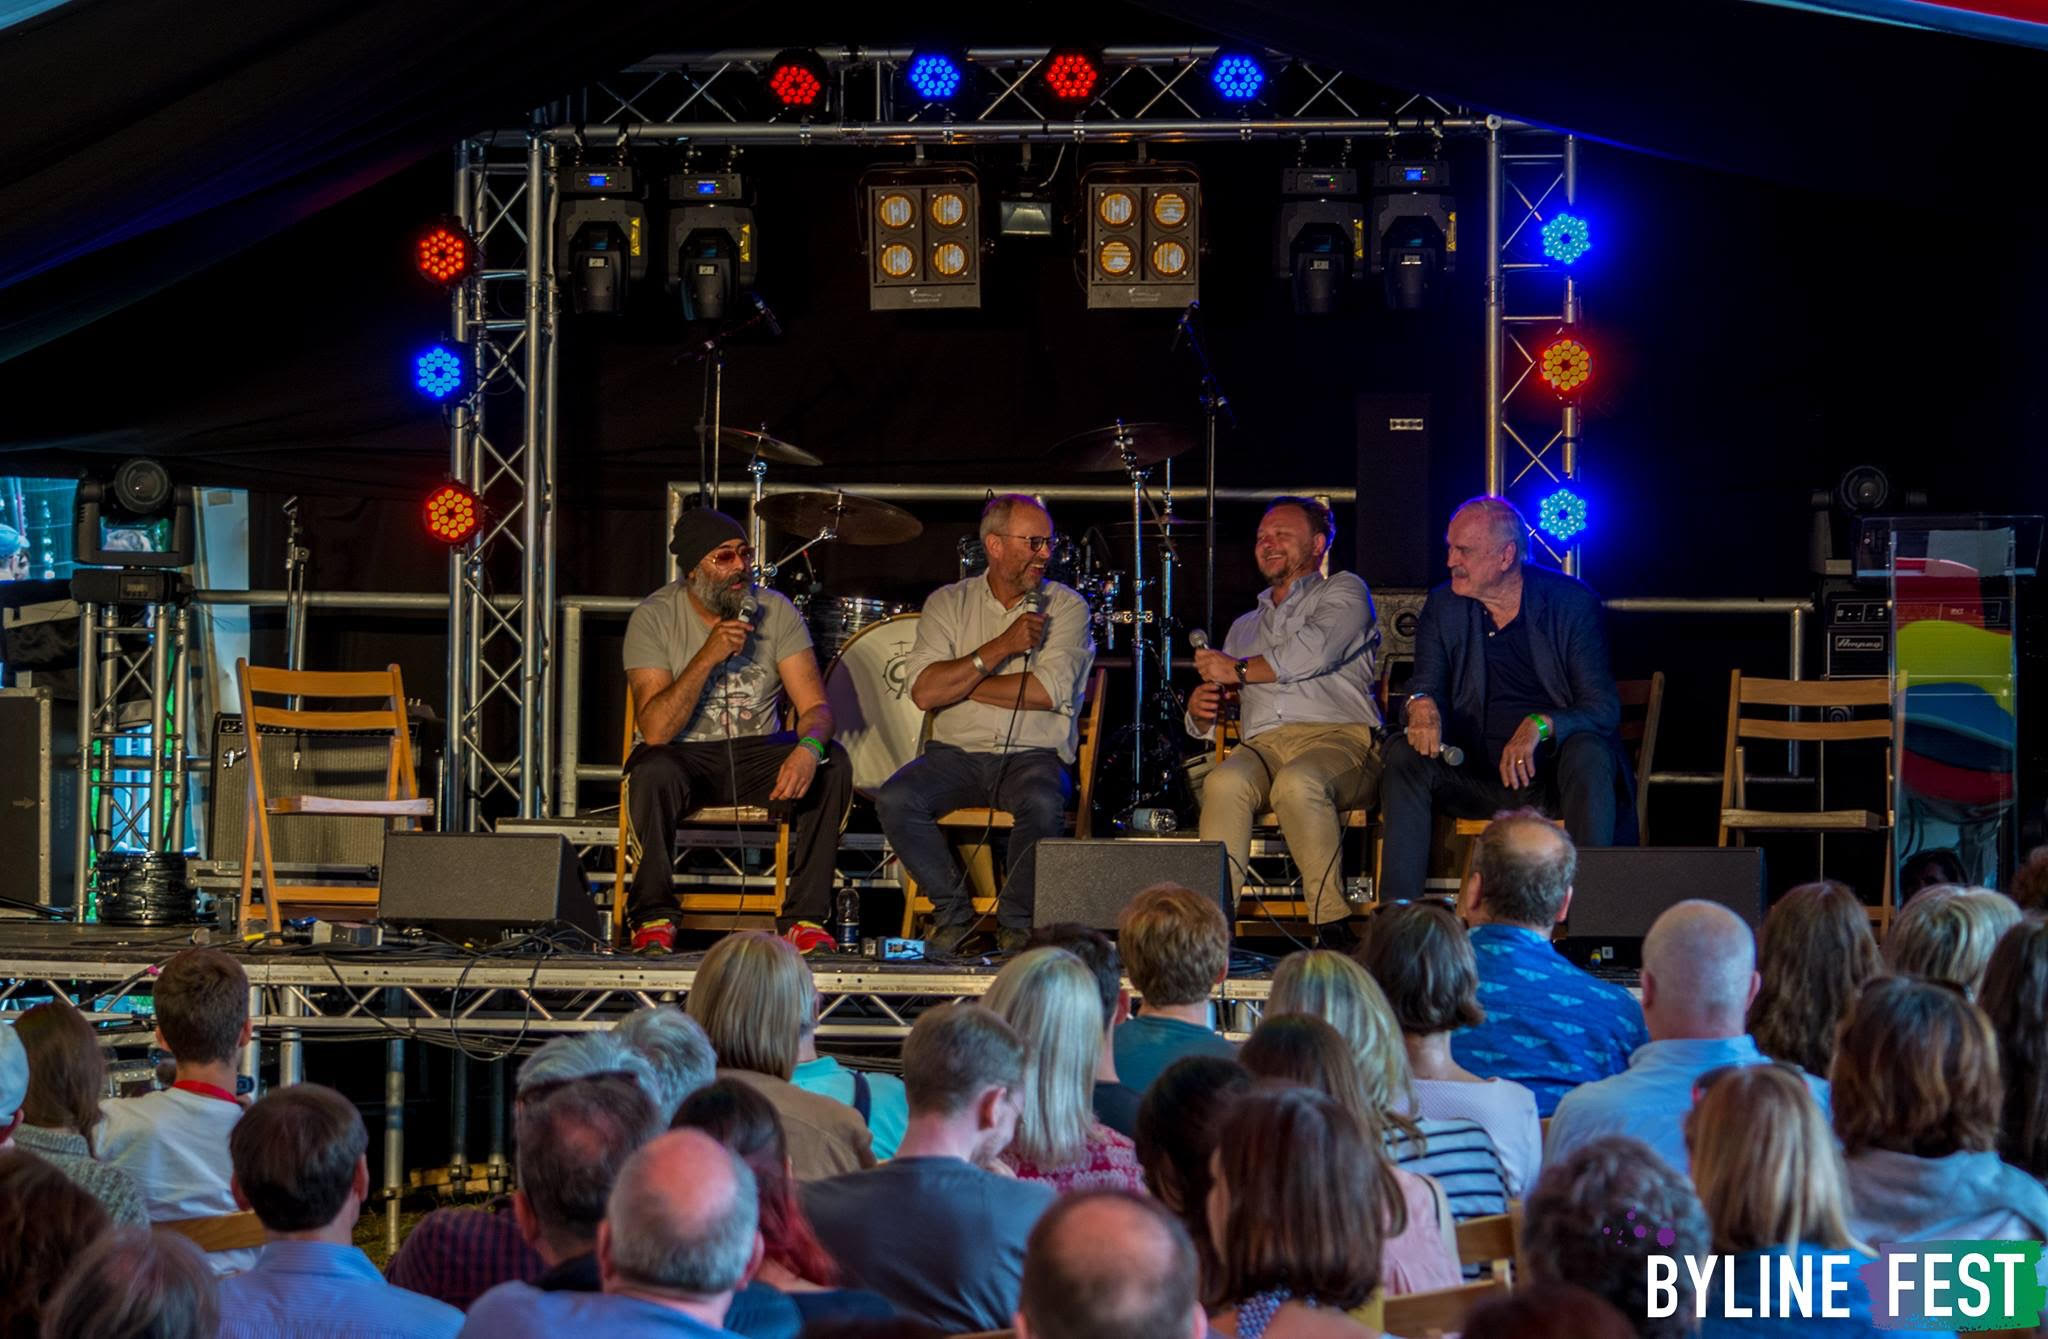 Byline Festival Friends - Support free speech and honest journalism